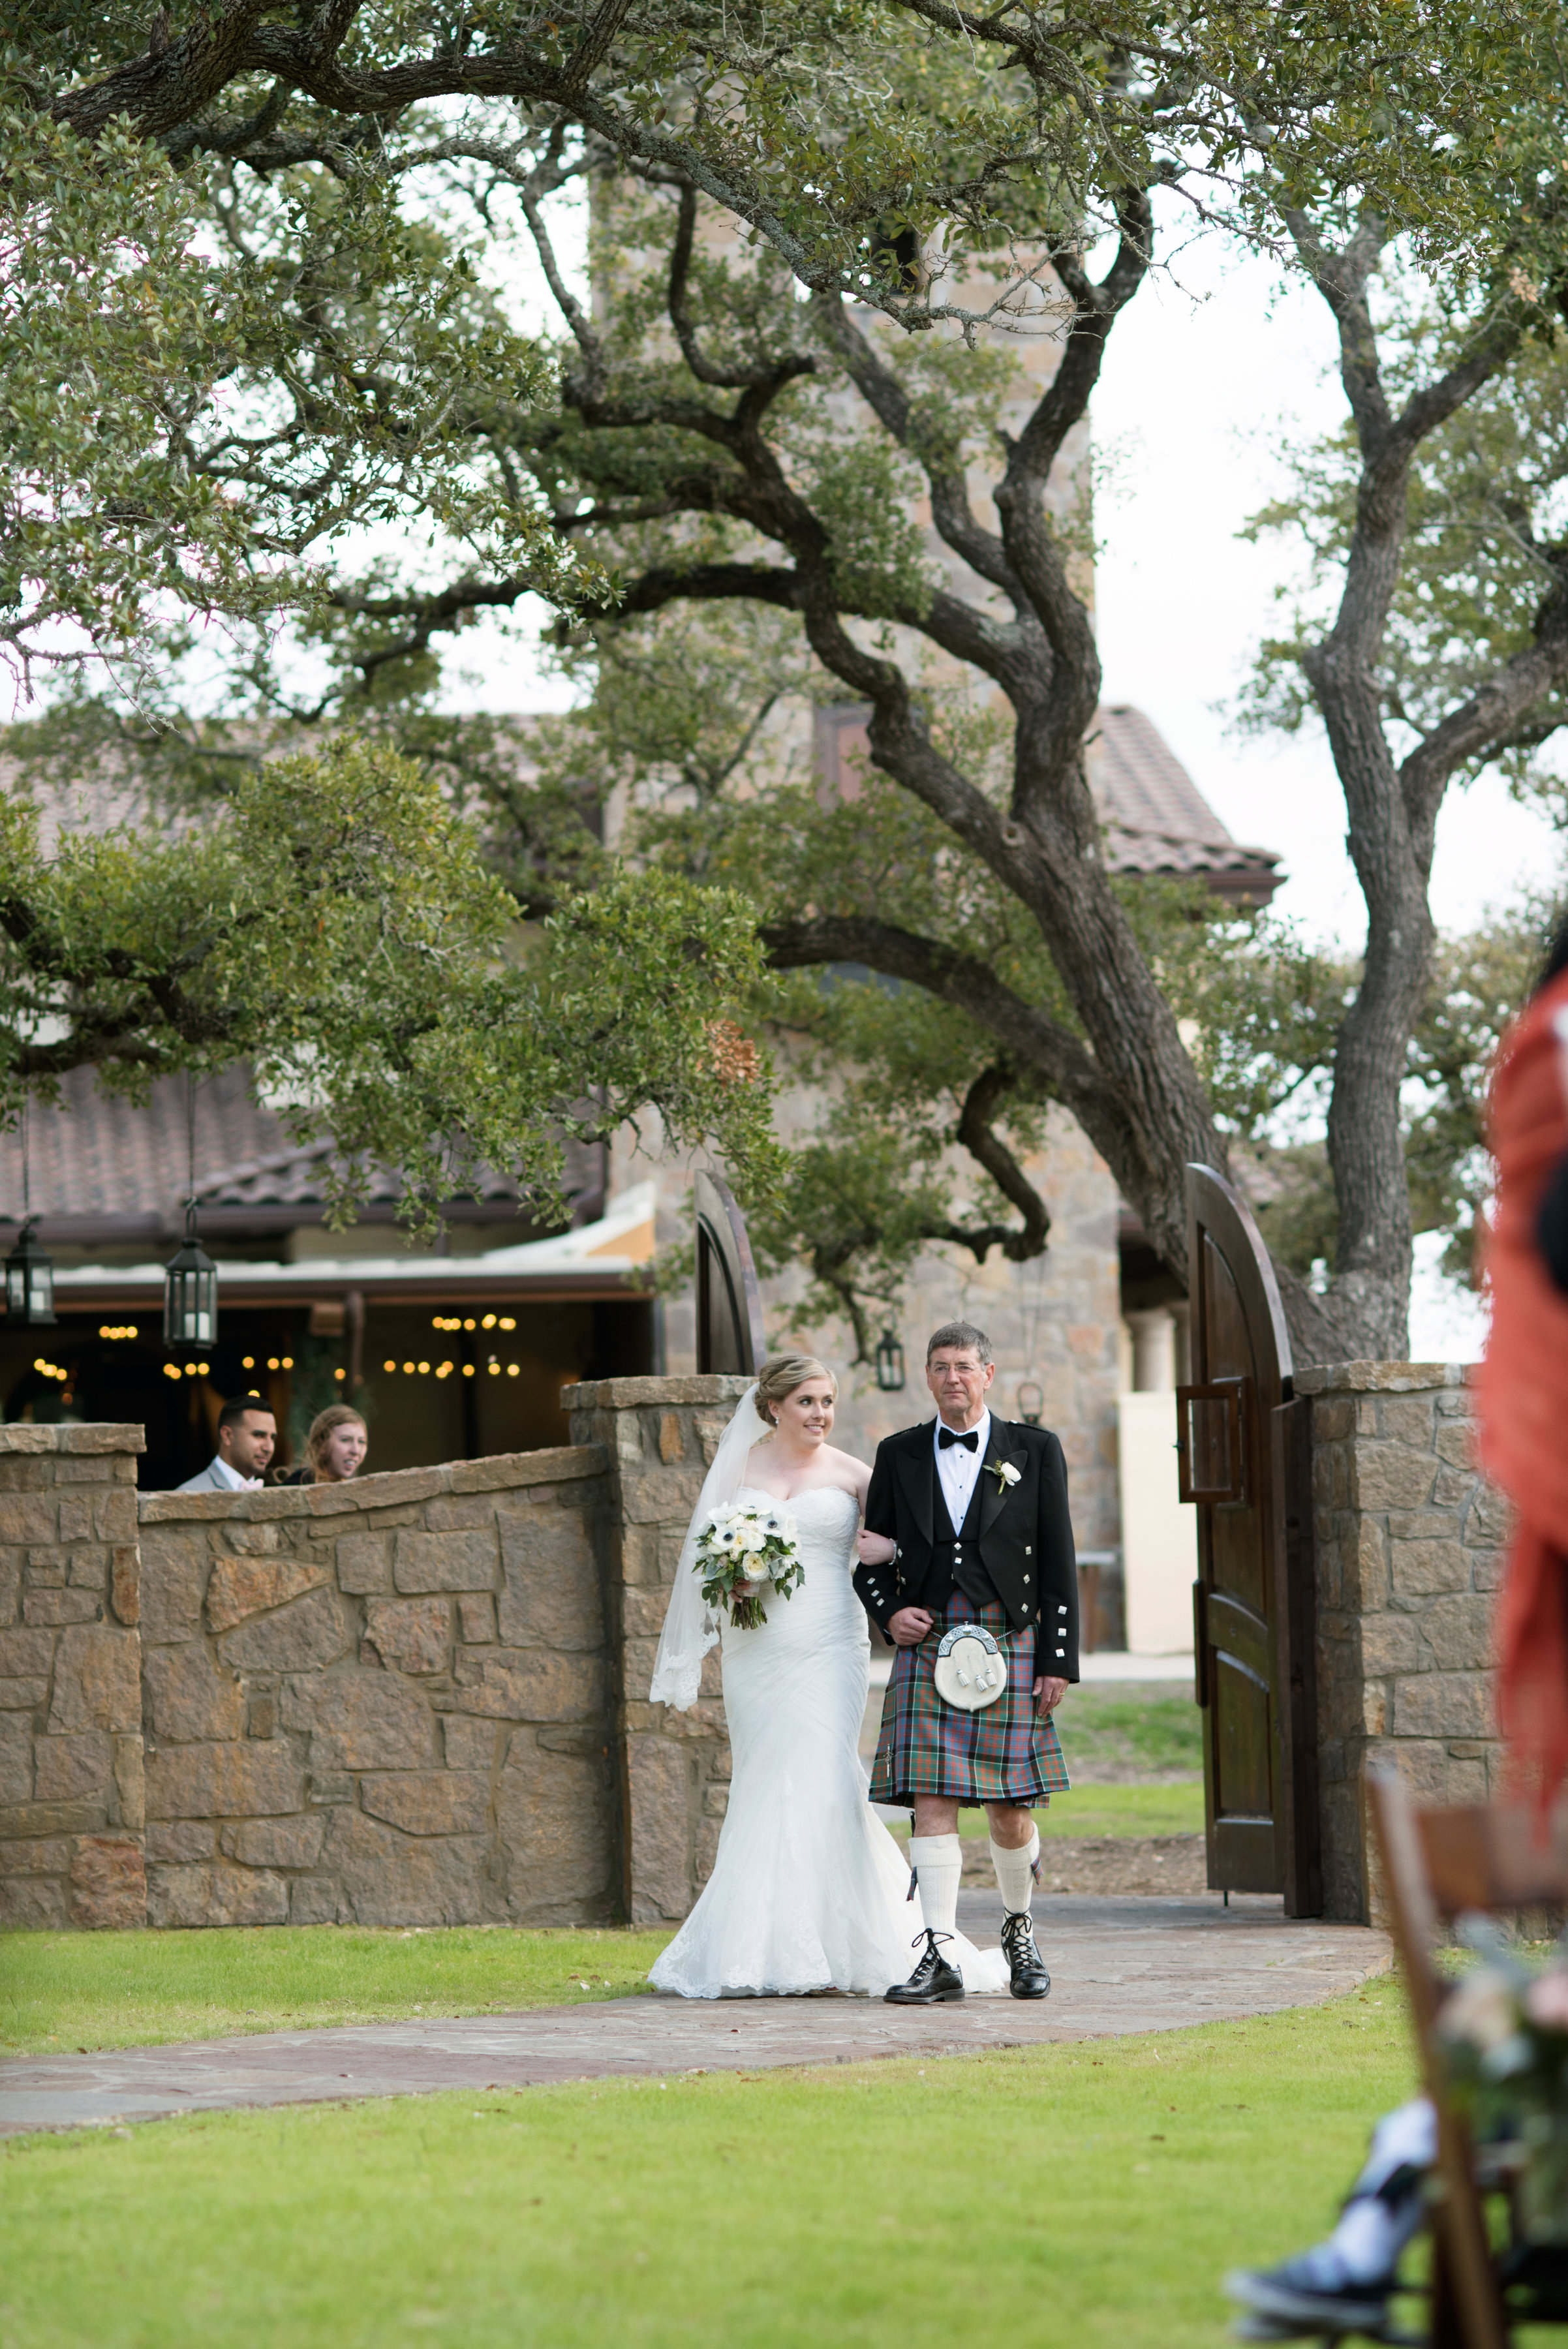 Ma Maison Austin Wedding Venue_ Austin Wedding Planner Heavenly Day Events _ Kristi Wright Austin Wedding Photographer20160306_0145.JPG